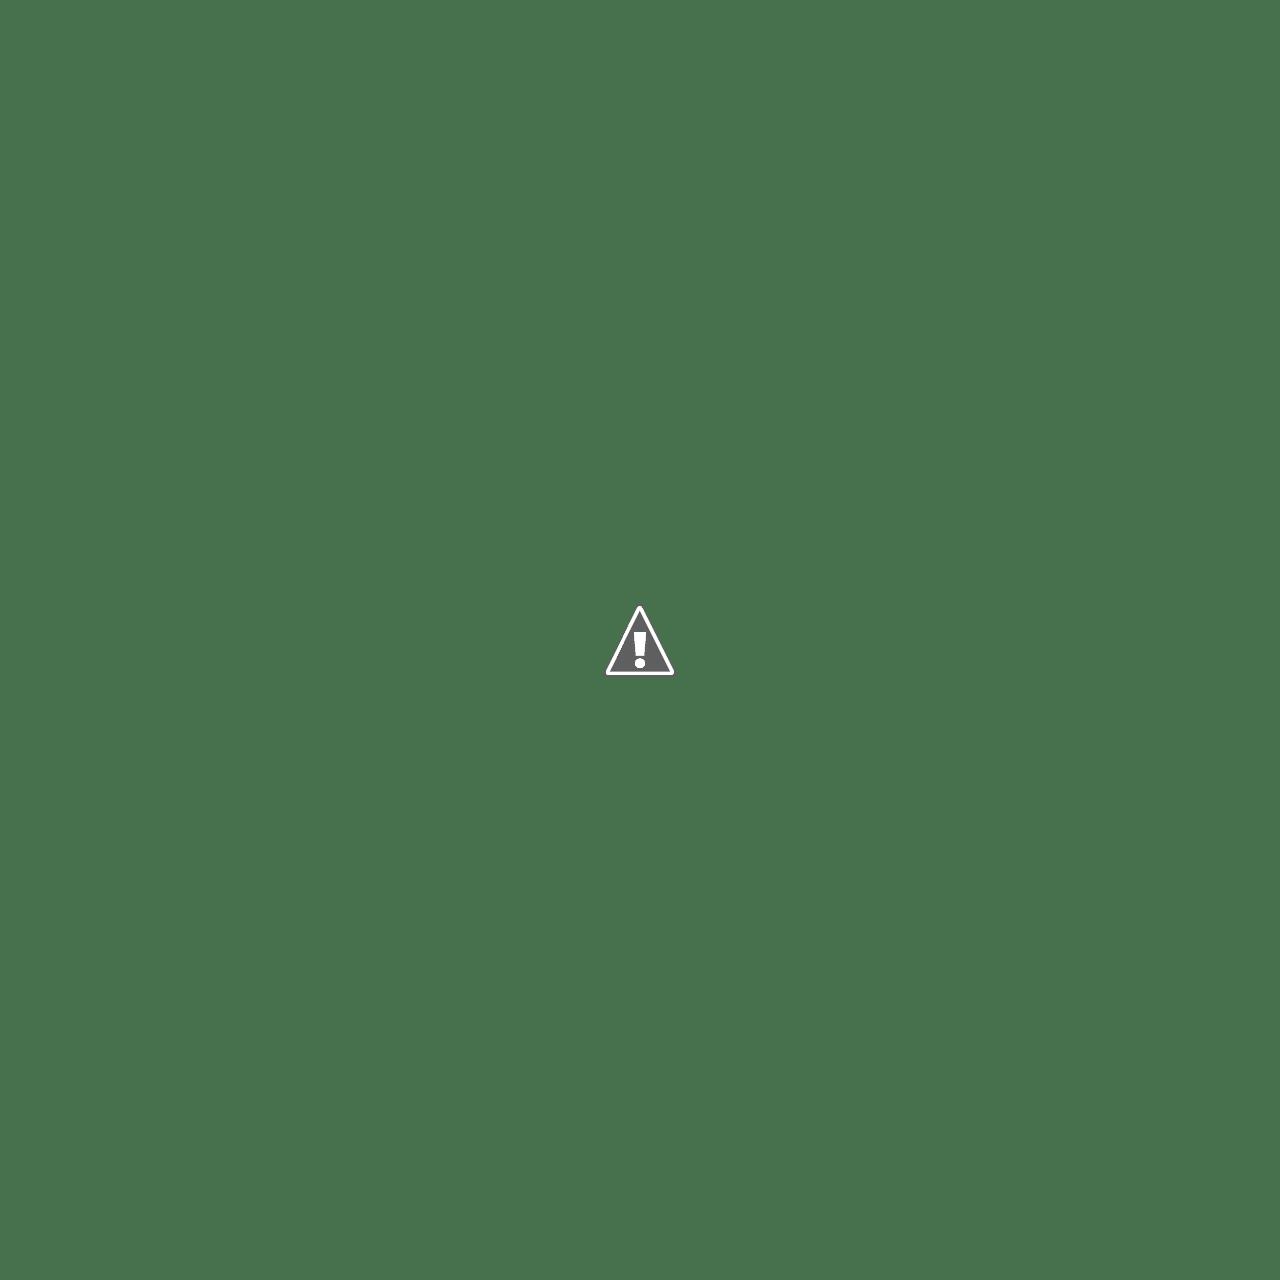 Mias flower designs florist make it special with mias izmirmasajfo